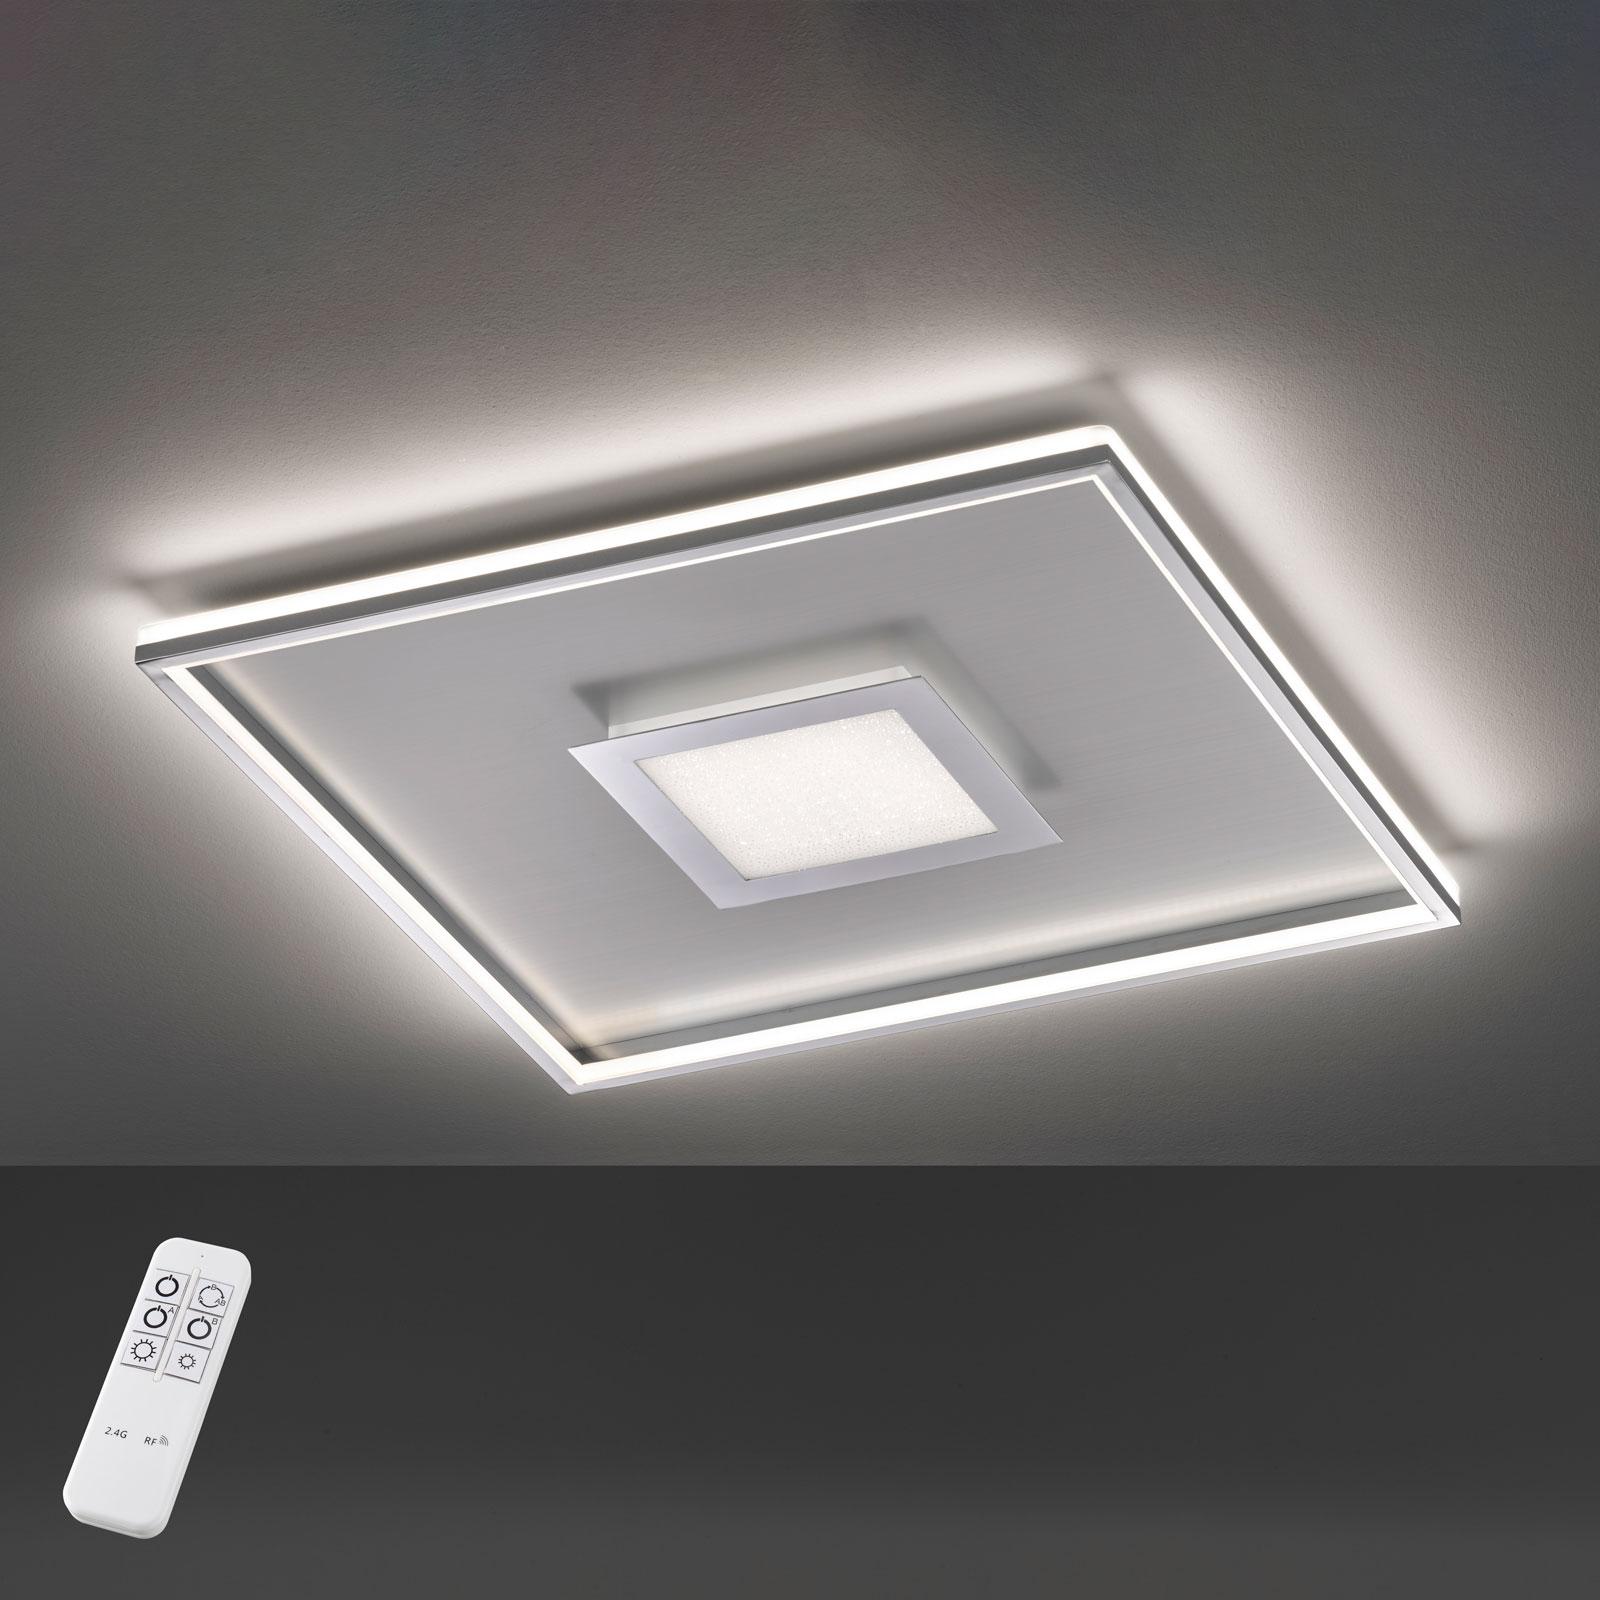 Lampa sufitowa LED Bug kwadratowa, chrom 80x80cm